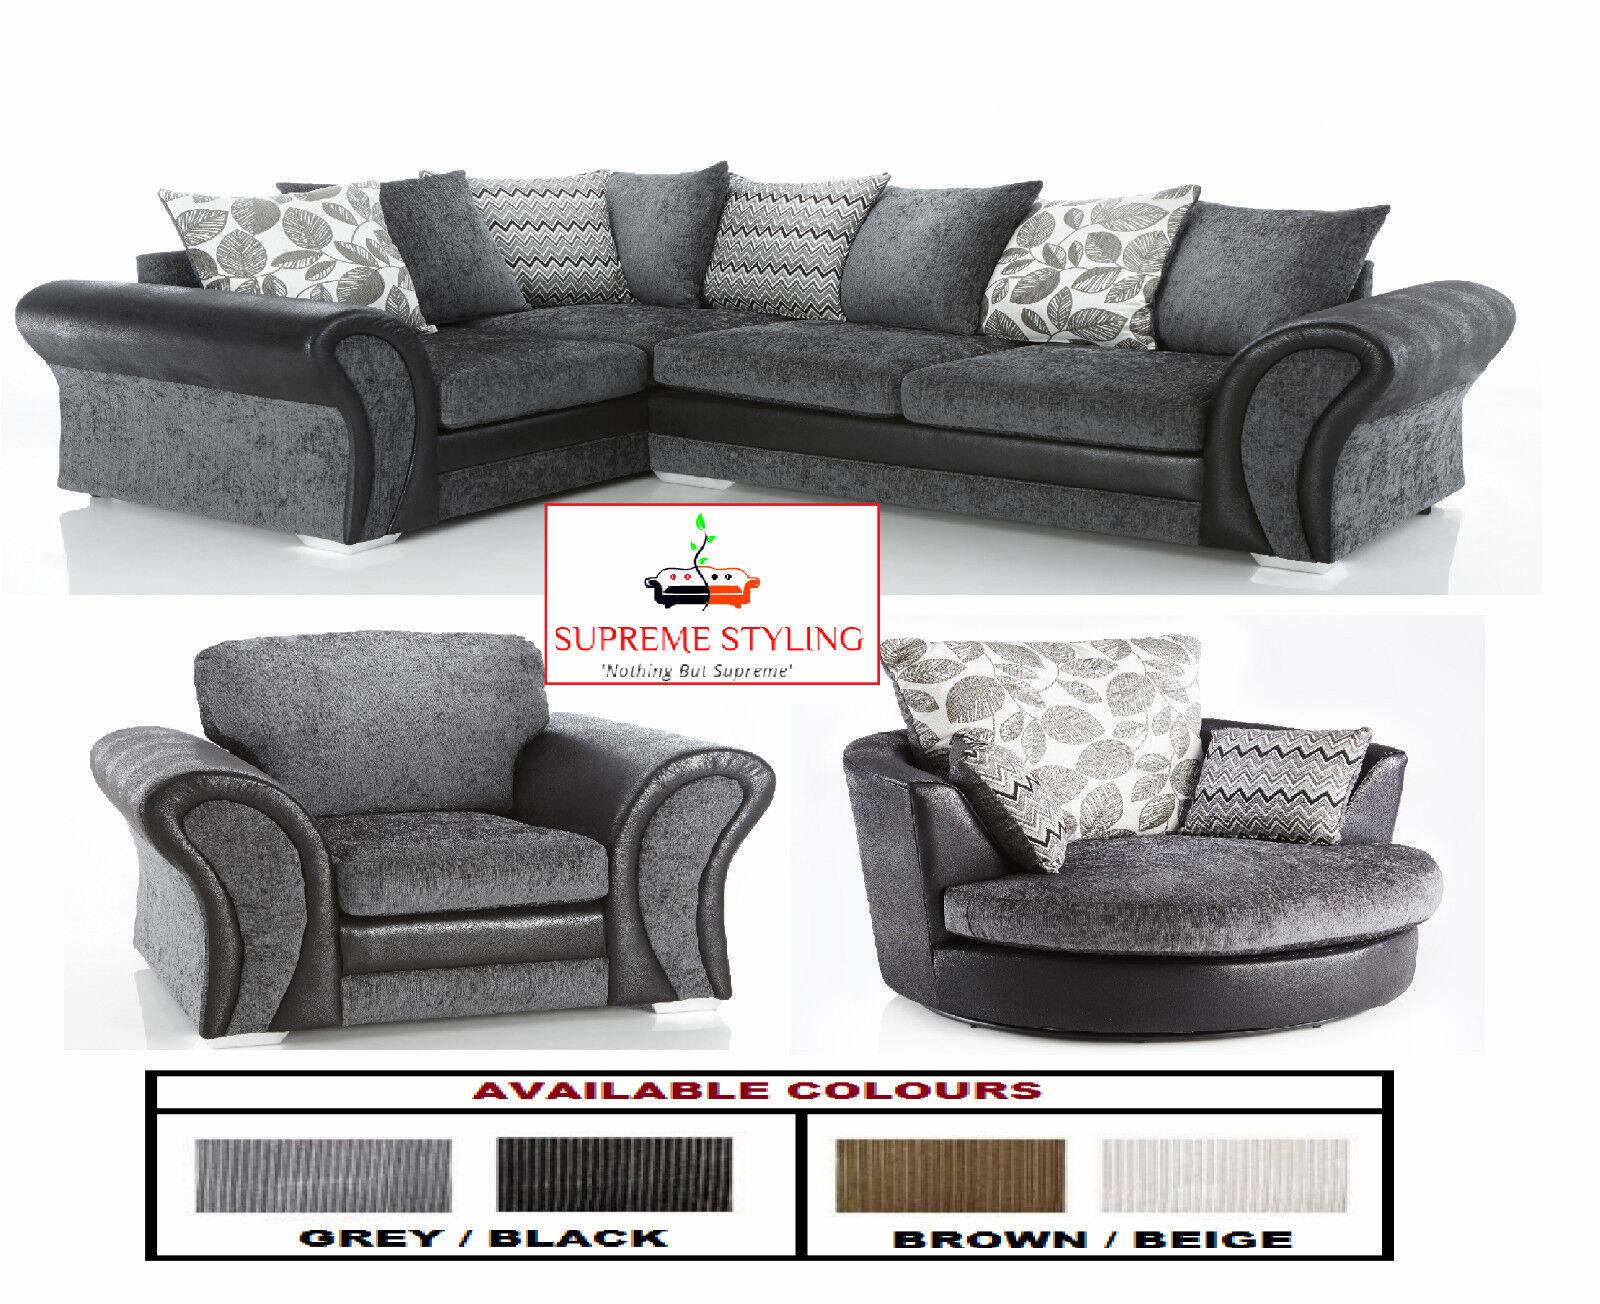 swivel cuddle chair york chairs on wheels for elderly brand new starlet corner sofa suite arm